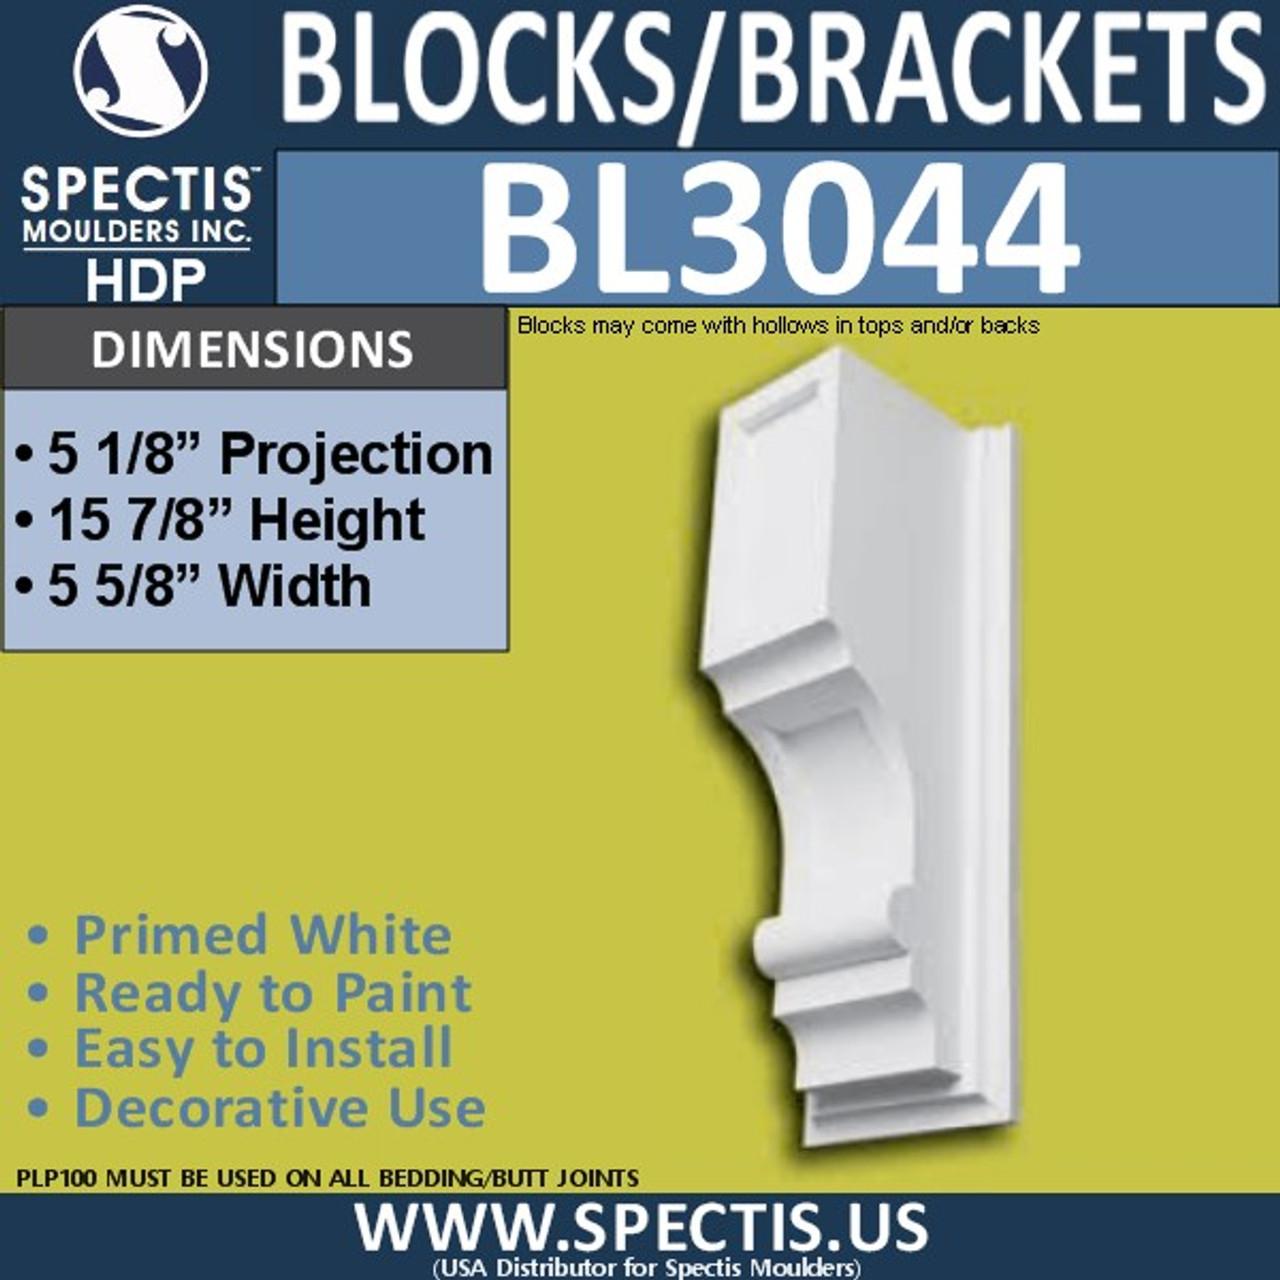 "BL3044 Eave Block or Bracket 5.63""W x 15.88""H x 5.13"" P"